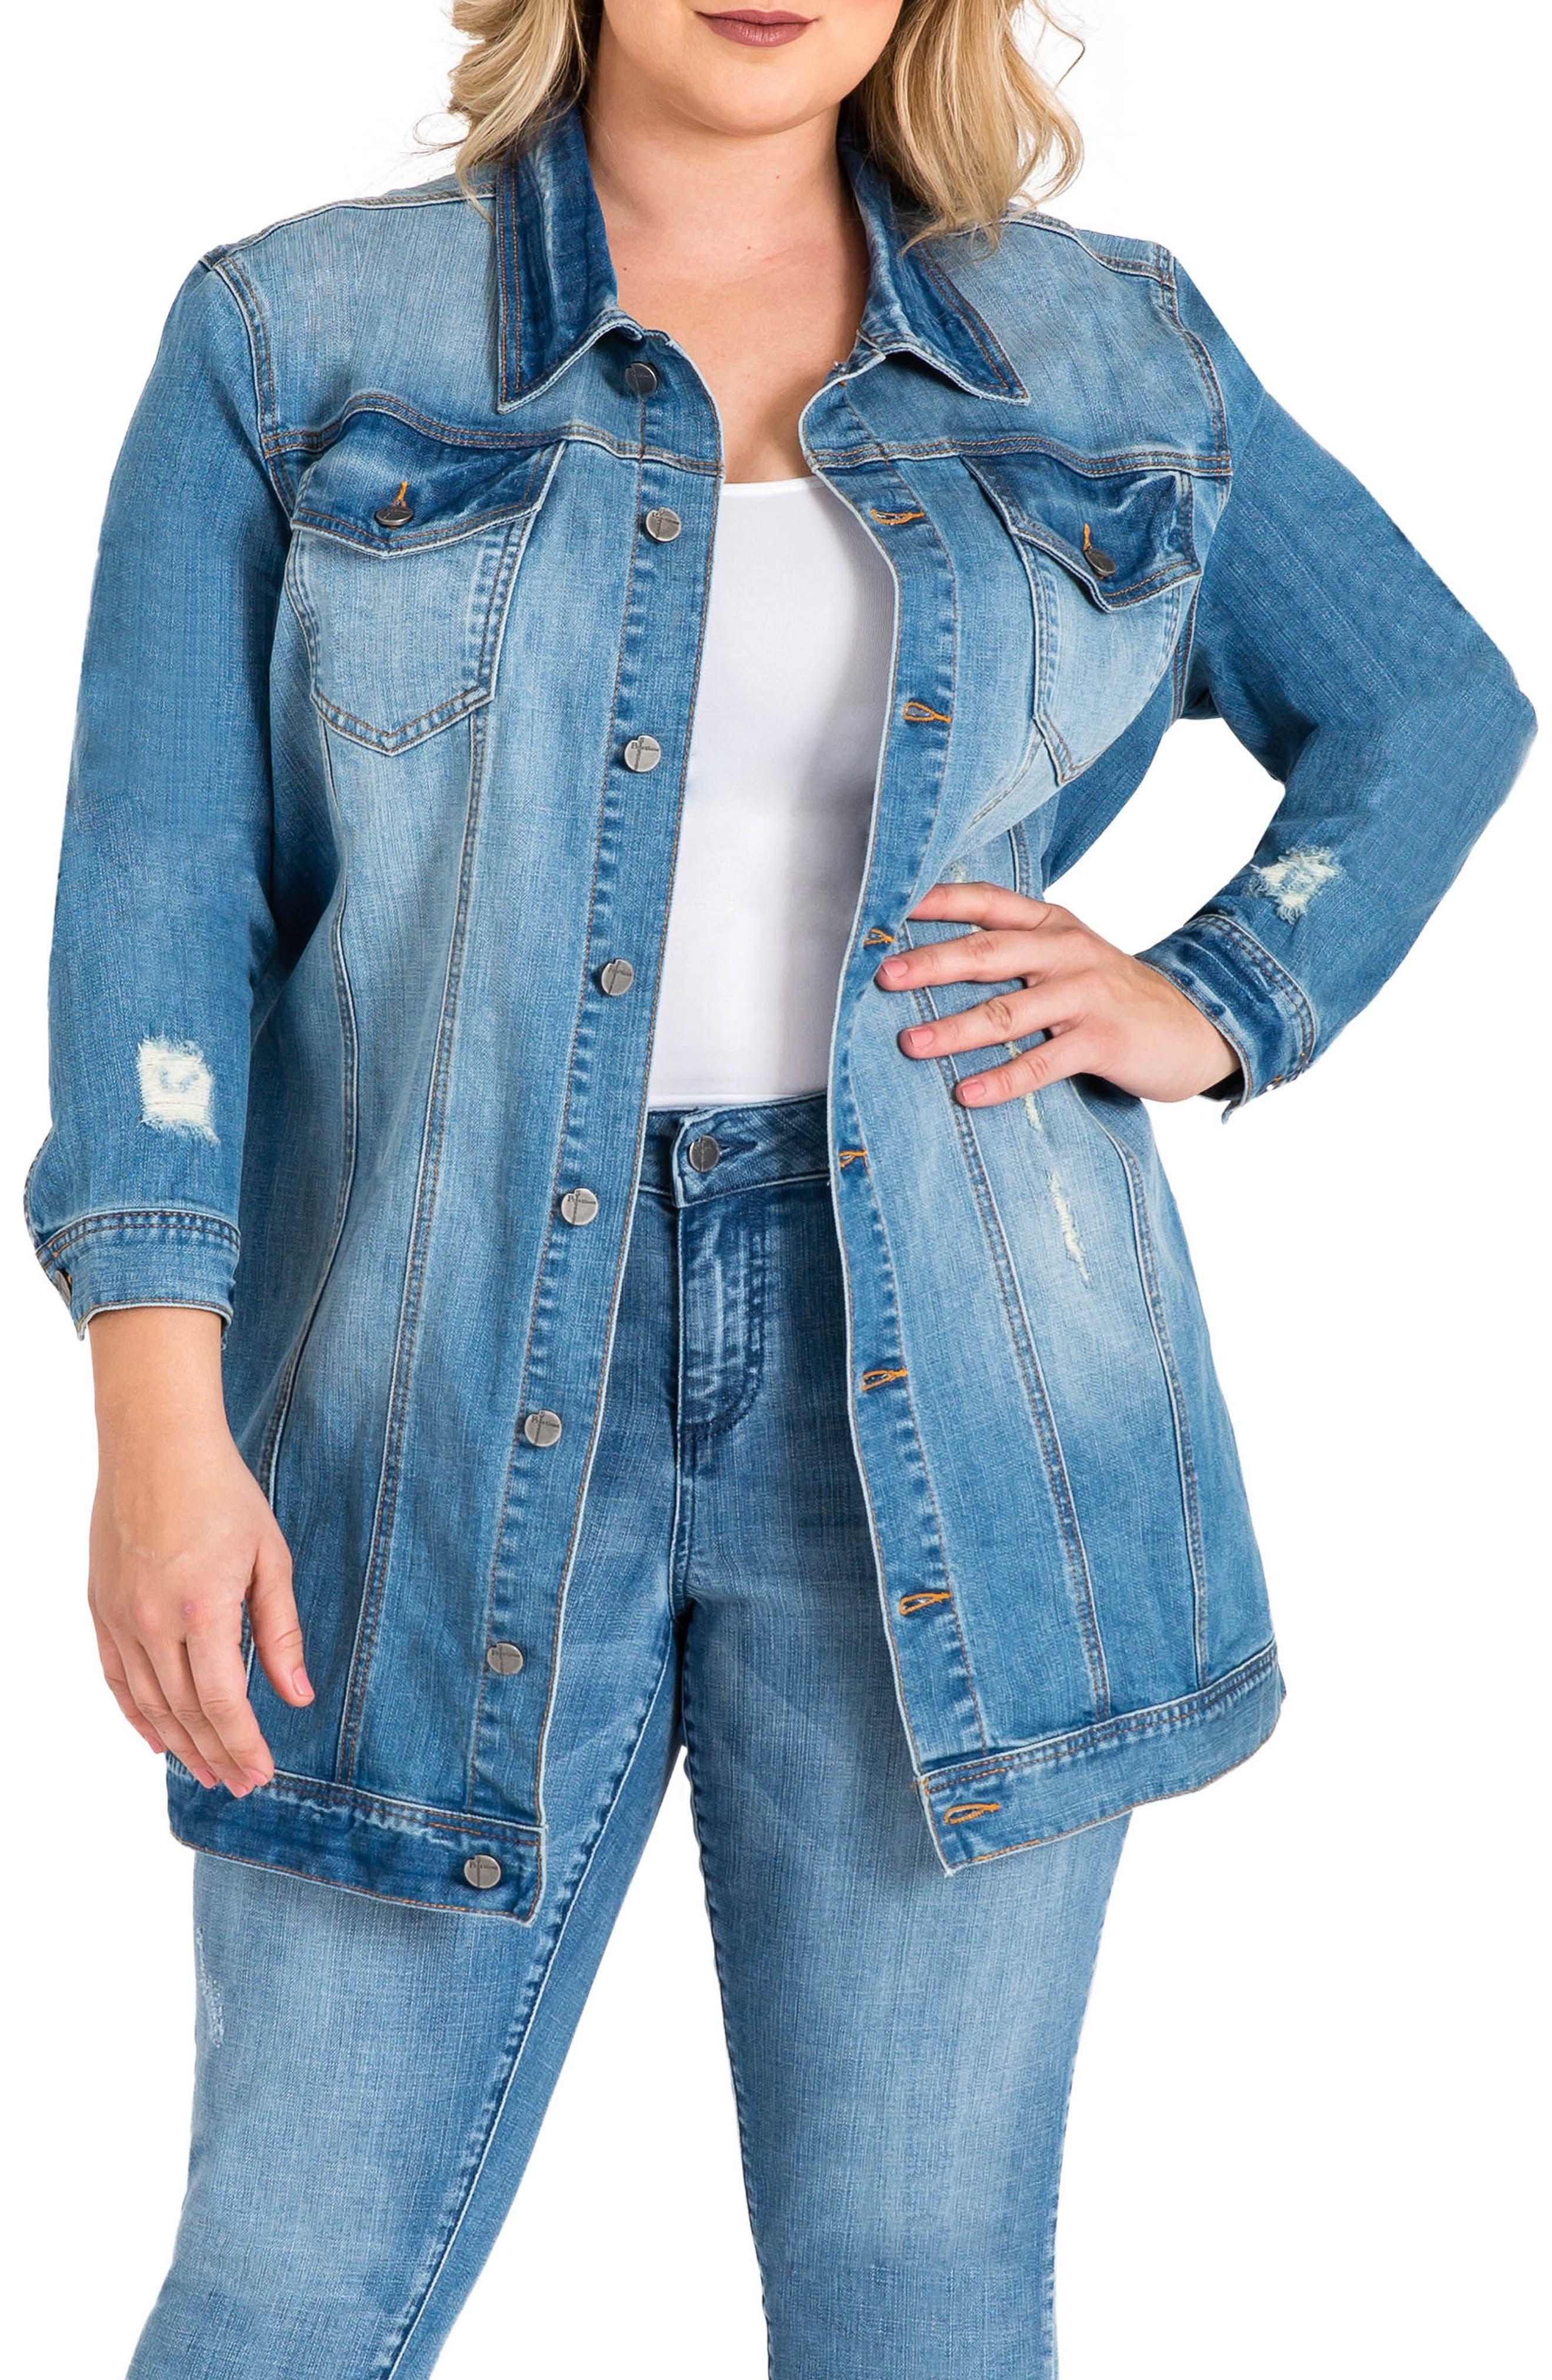 STANDARDS & PRACTICES, Margot Longline Denim Jacket, Main thumbnail 1, color, LIGHT BLUE